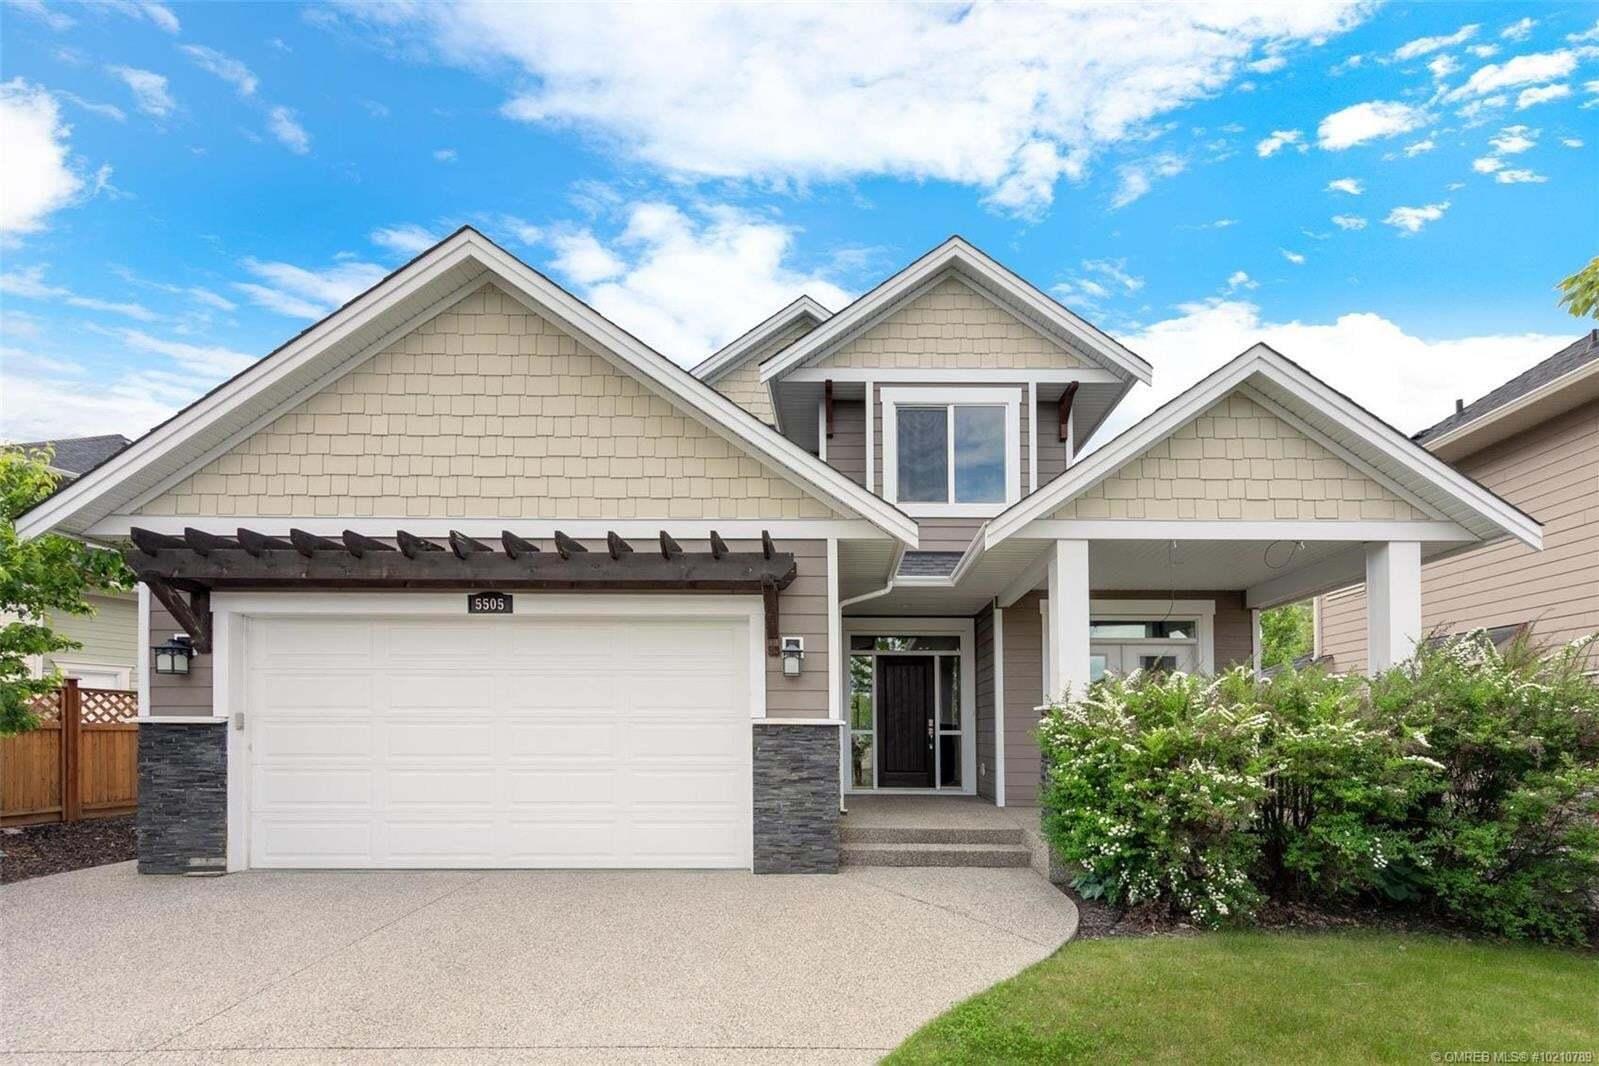 House for sale at 5505 Lee Ln Kelowna British Columbia - MLS: 10210789